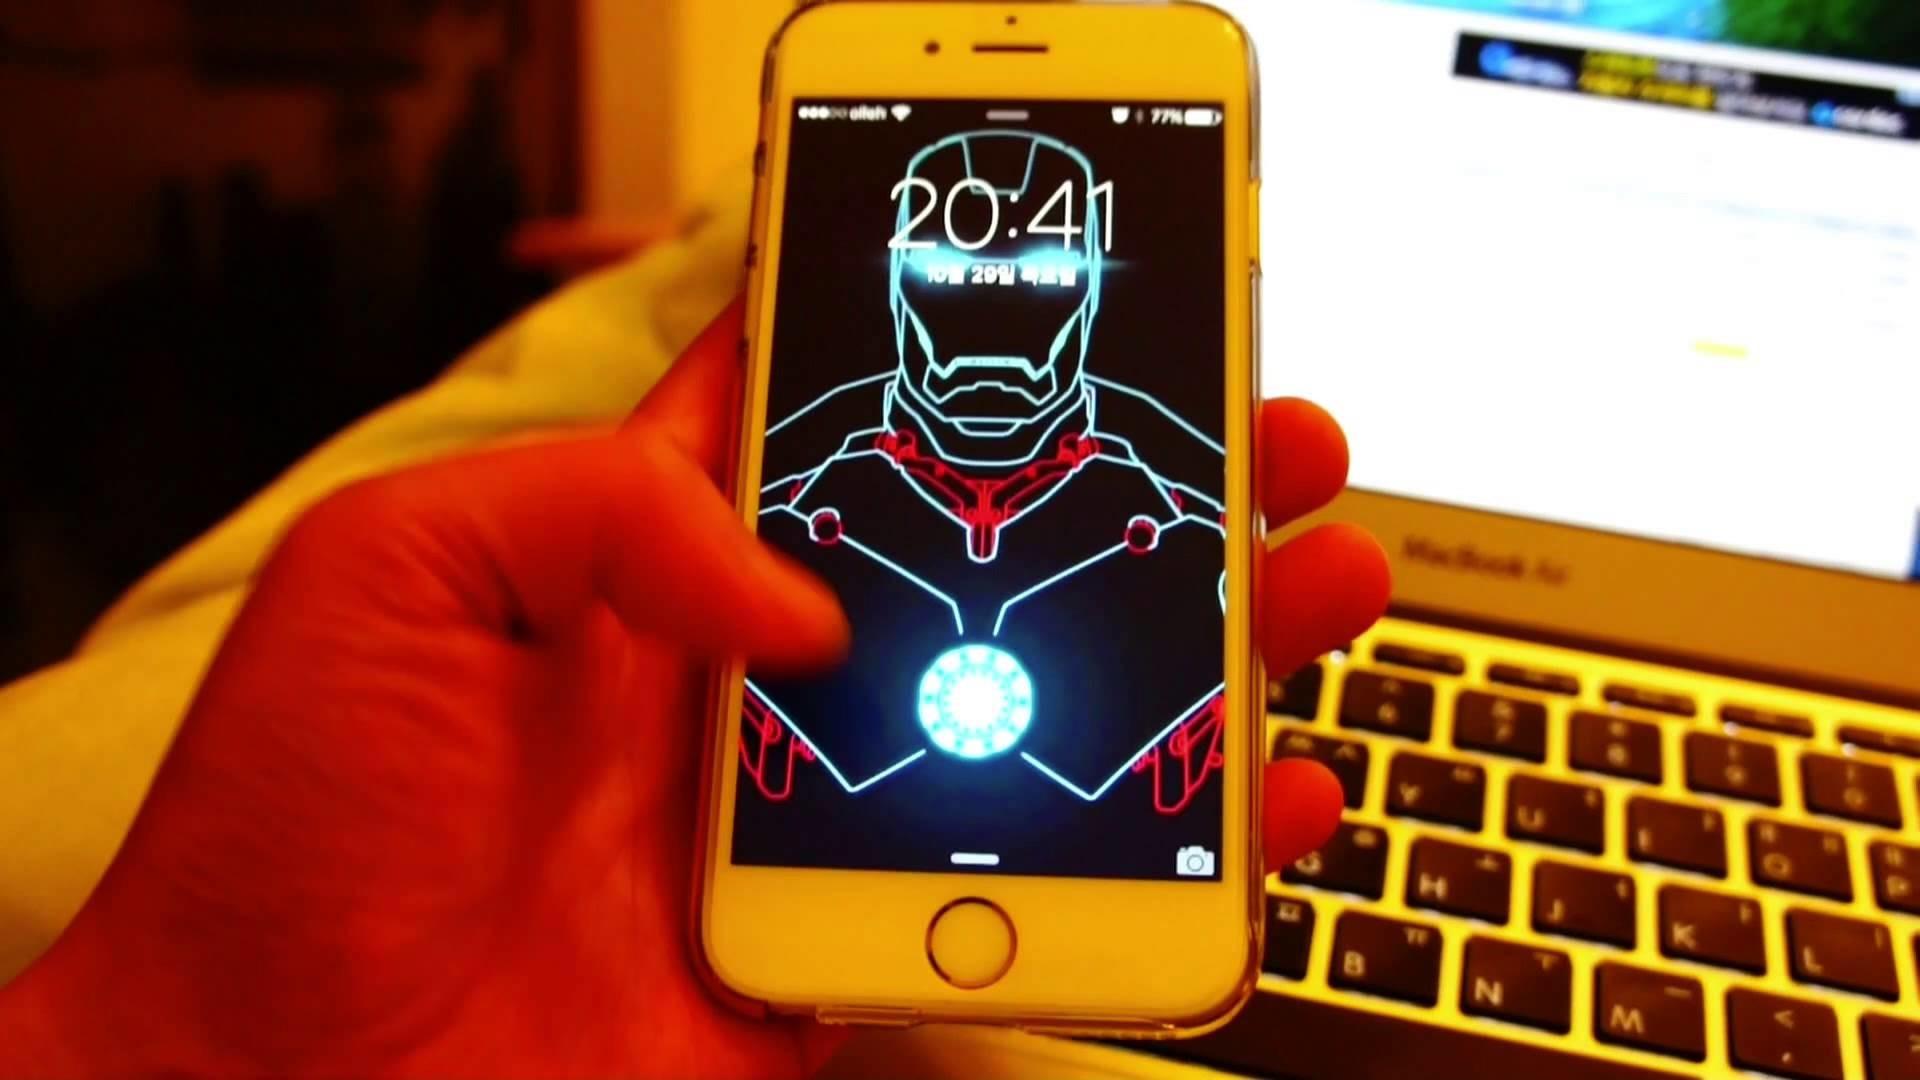 JARVIS MARK 3 – IPHONE 4 LOCKSCREEN WALLPAPER by hyugewb on DeviantArt